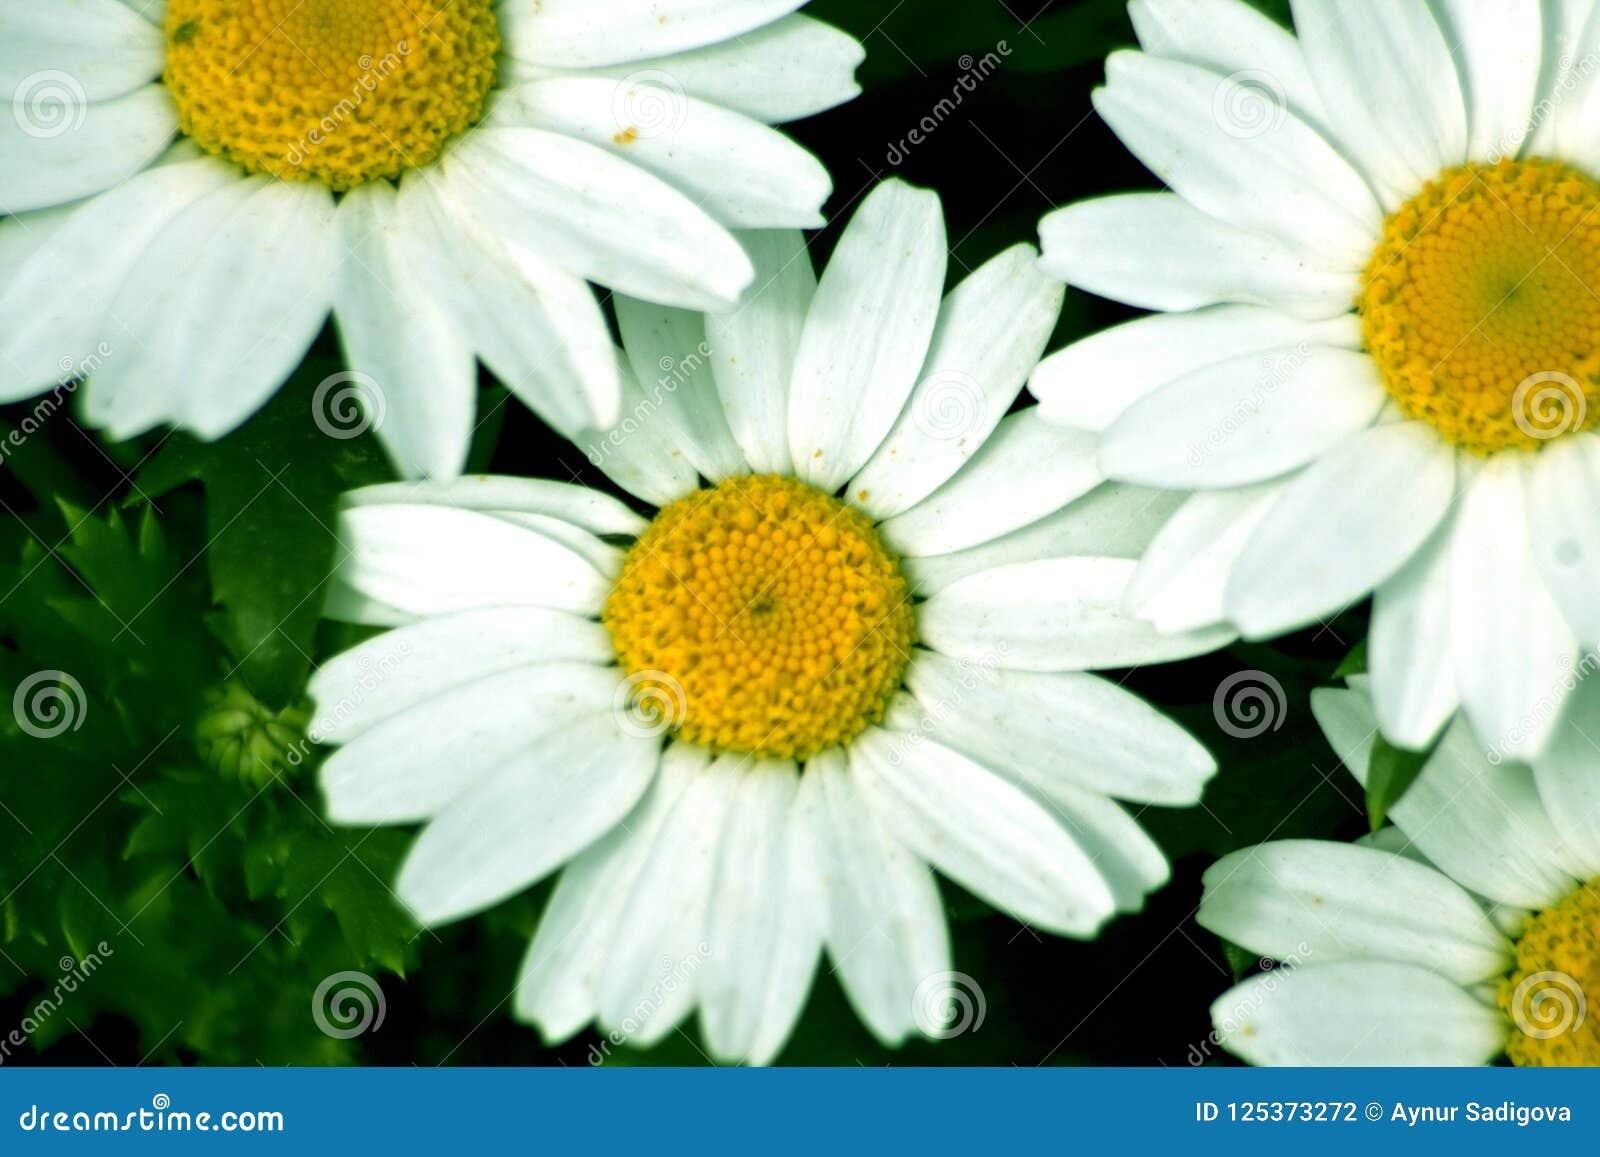 Daisy camomile flower daisy flower papatya stock photo image of download daisy camomile flower daisy flower papatya stock photo image of herbal izmirmasajfo